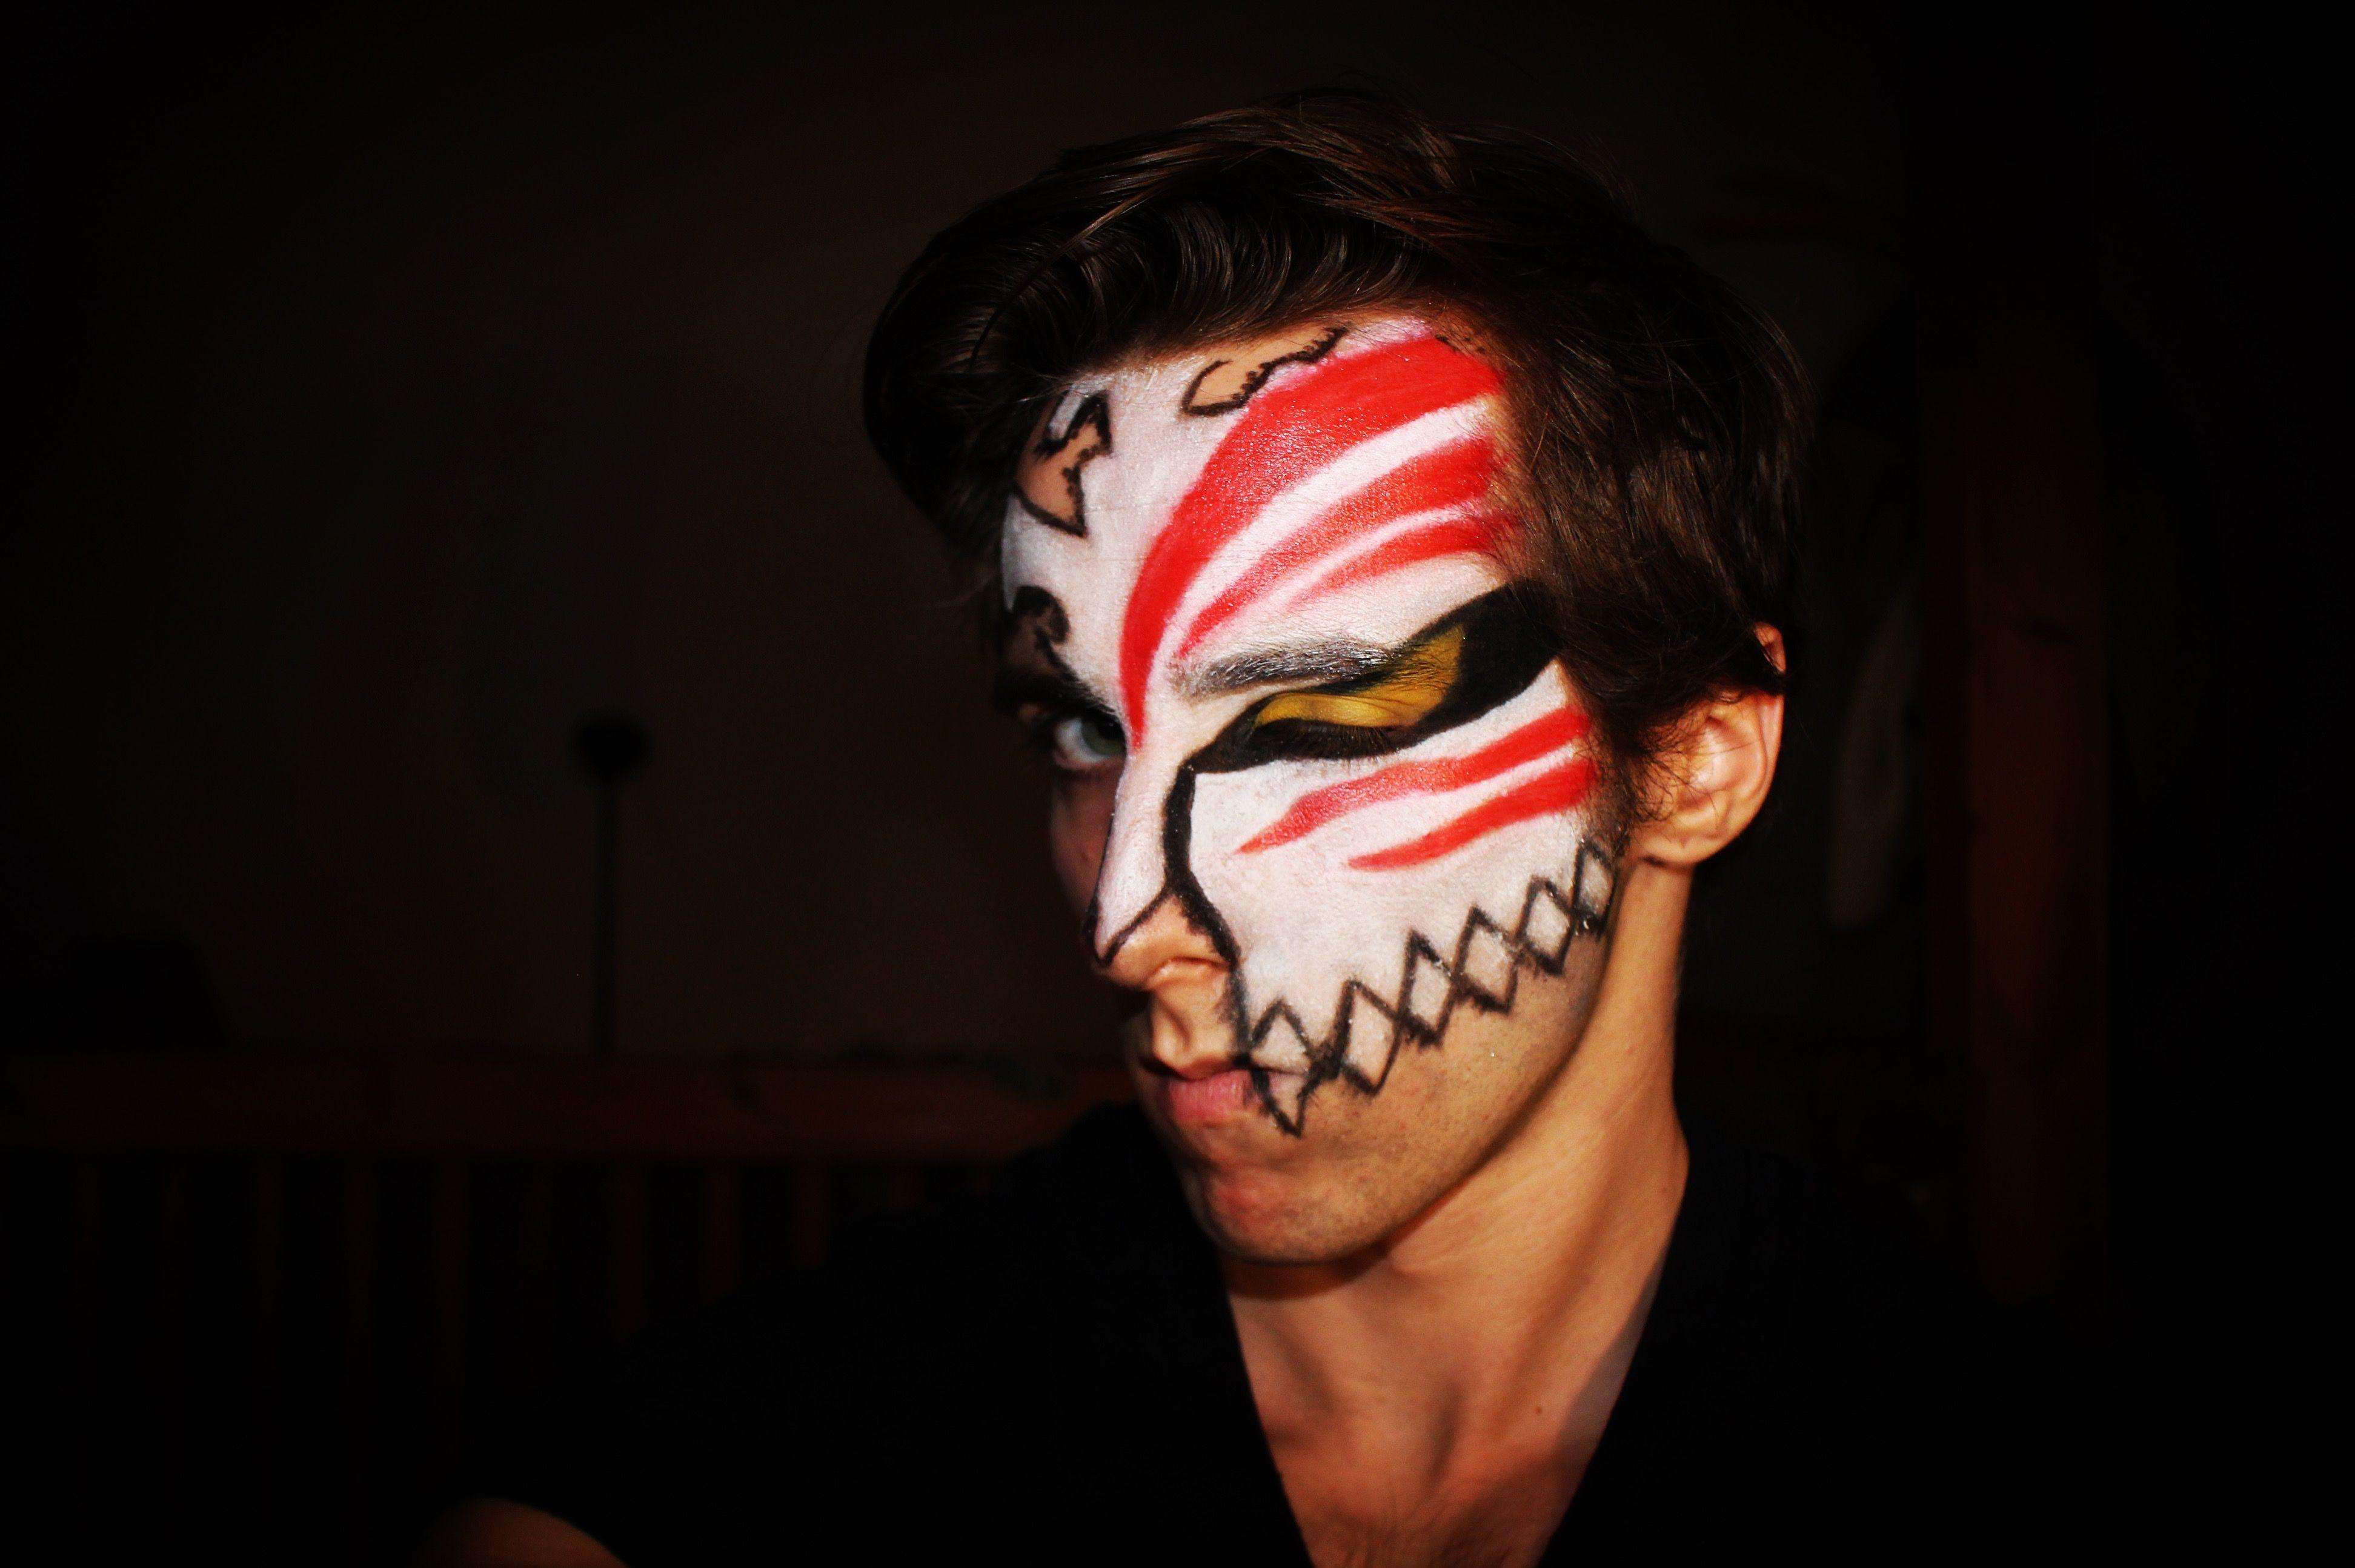 Ichigo Hollow Mask Makeup Ichigo Bleach Hollow Hollowichigo Hollowmask Ichigomask Ichigomakeup Mask Eyeshadow Halloween Face Makeup Mask Makeup Makeup